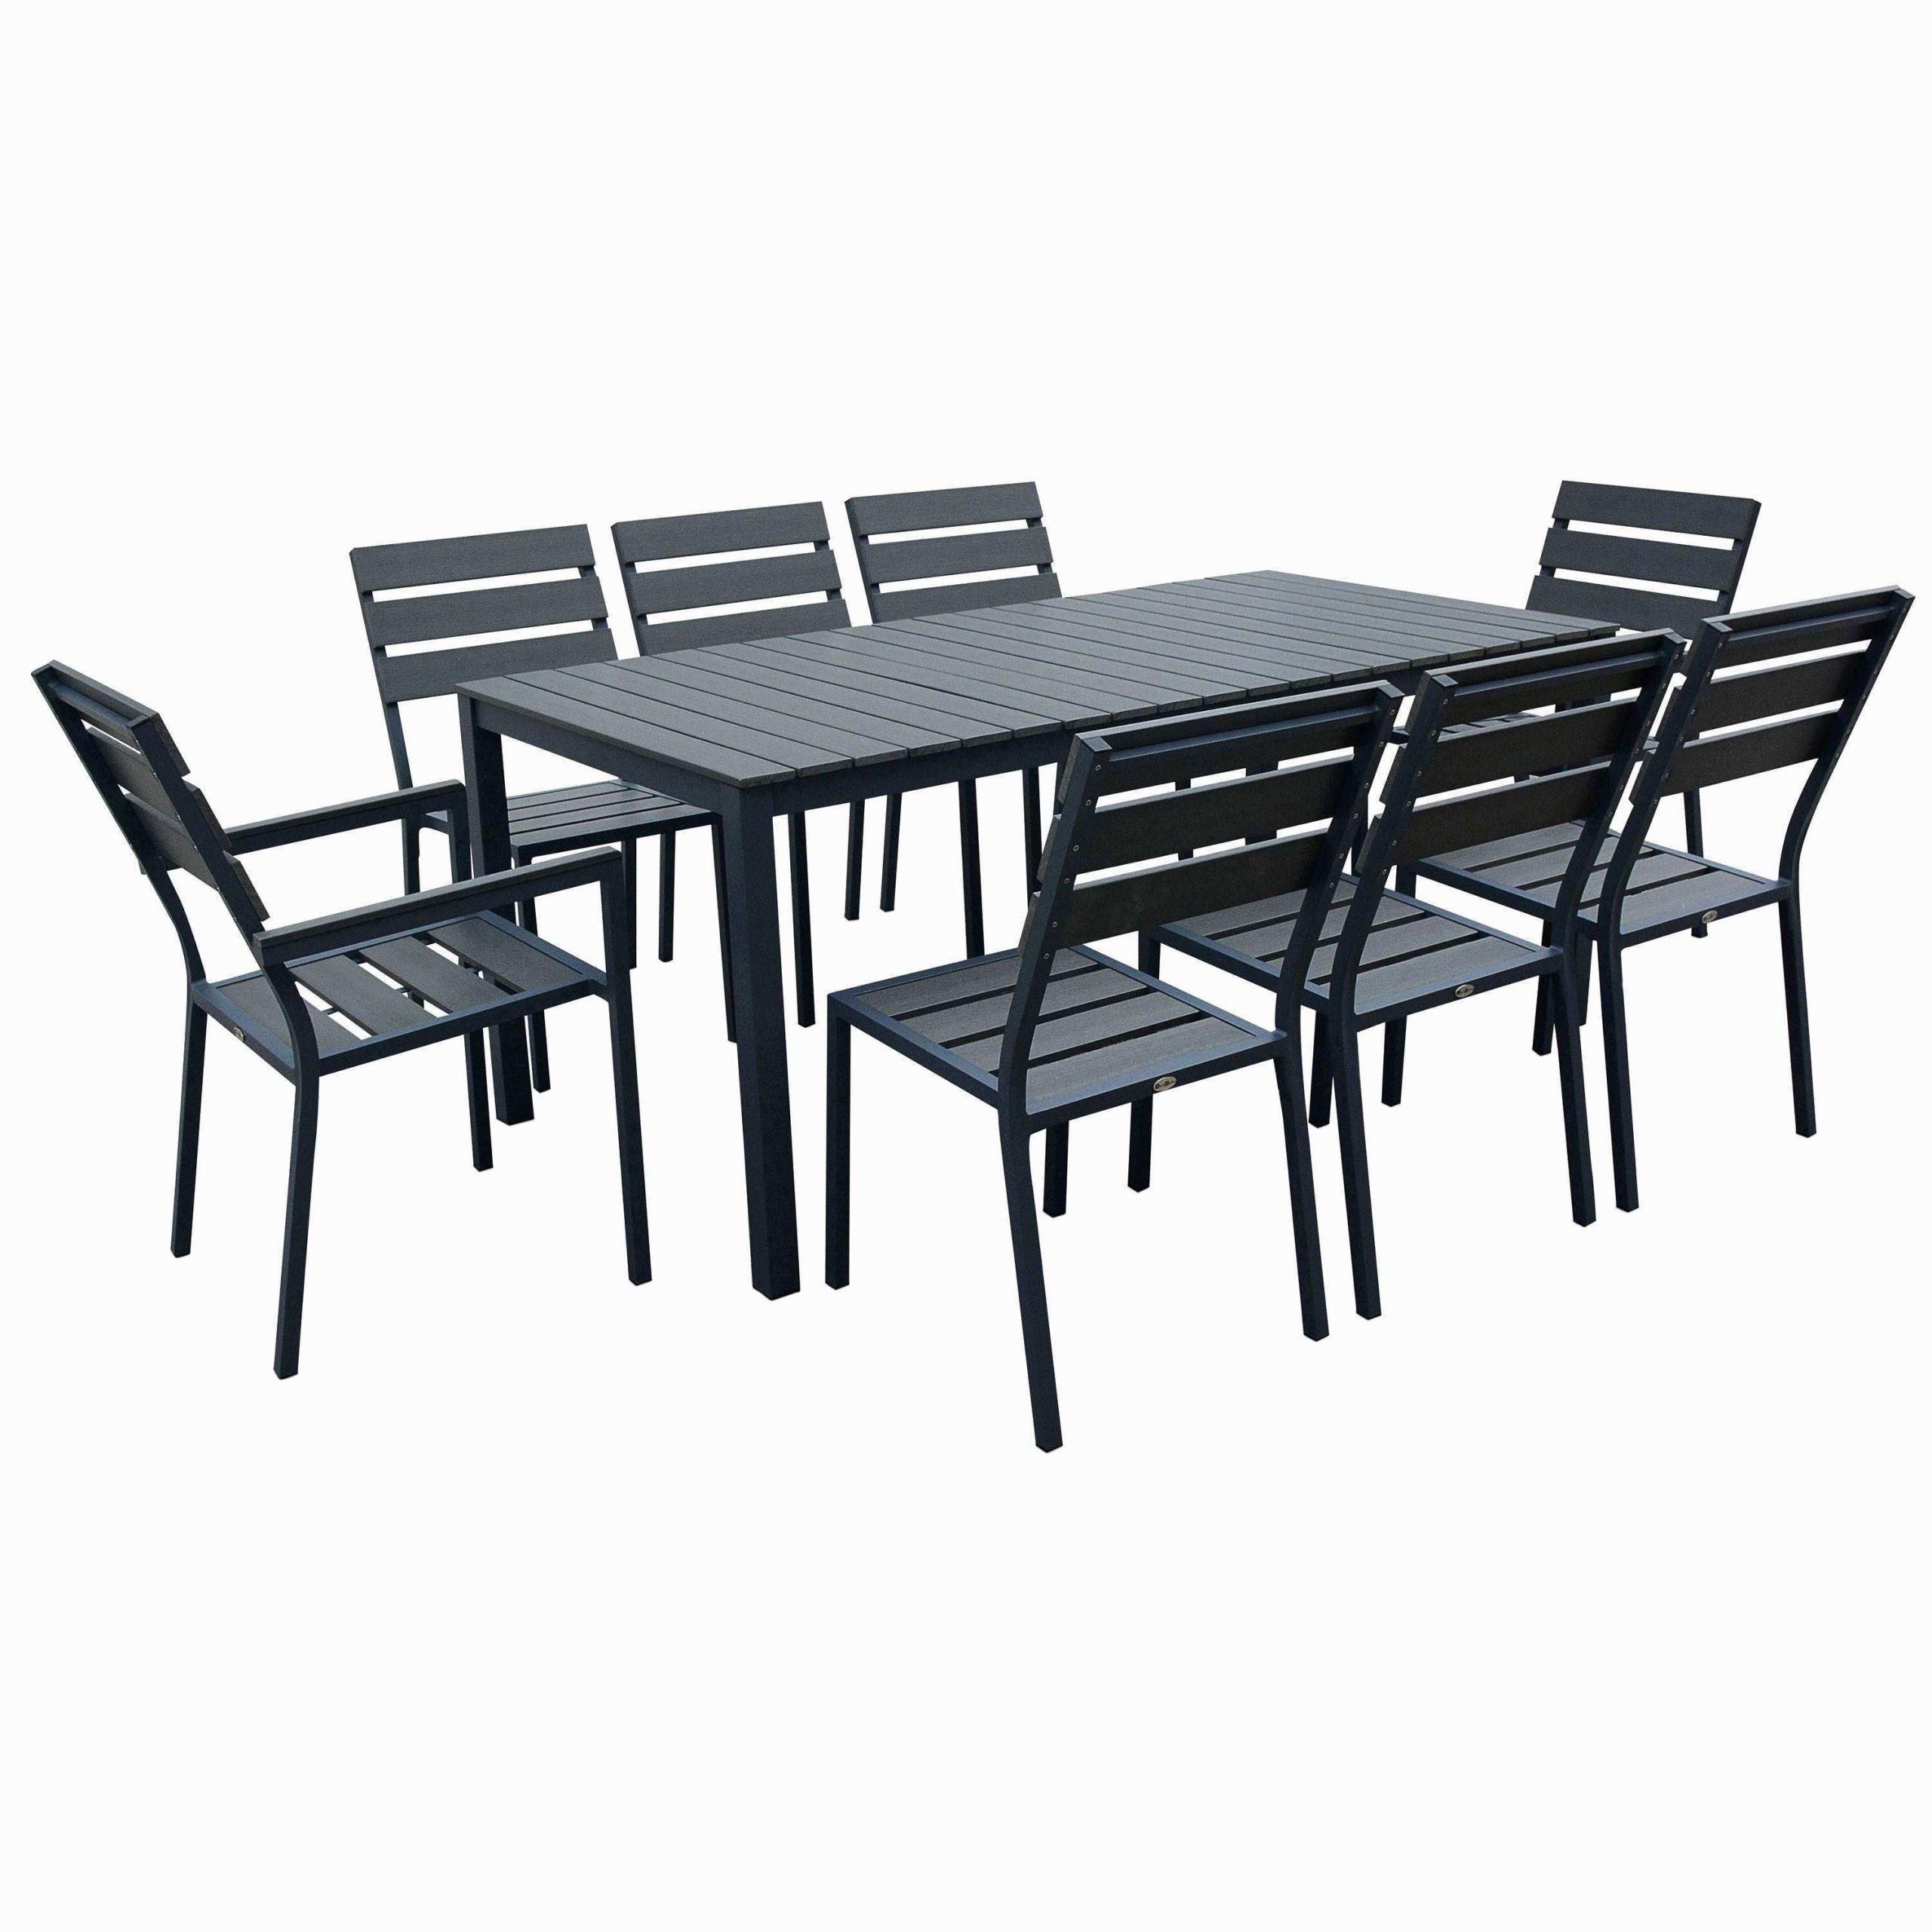 table de terrasse pas cher luxury cdiscount table de jardin of table de terrasse pas cher